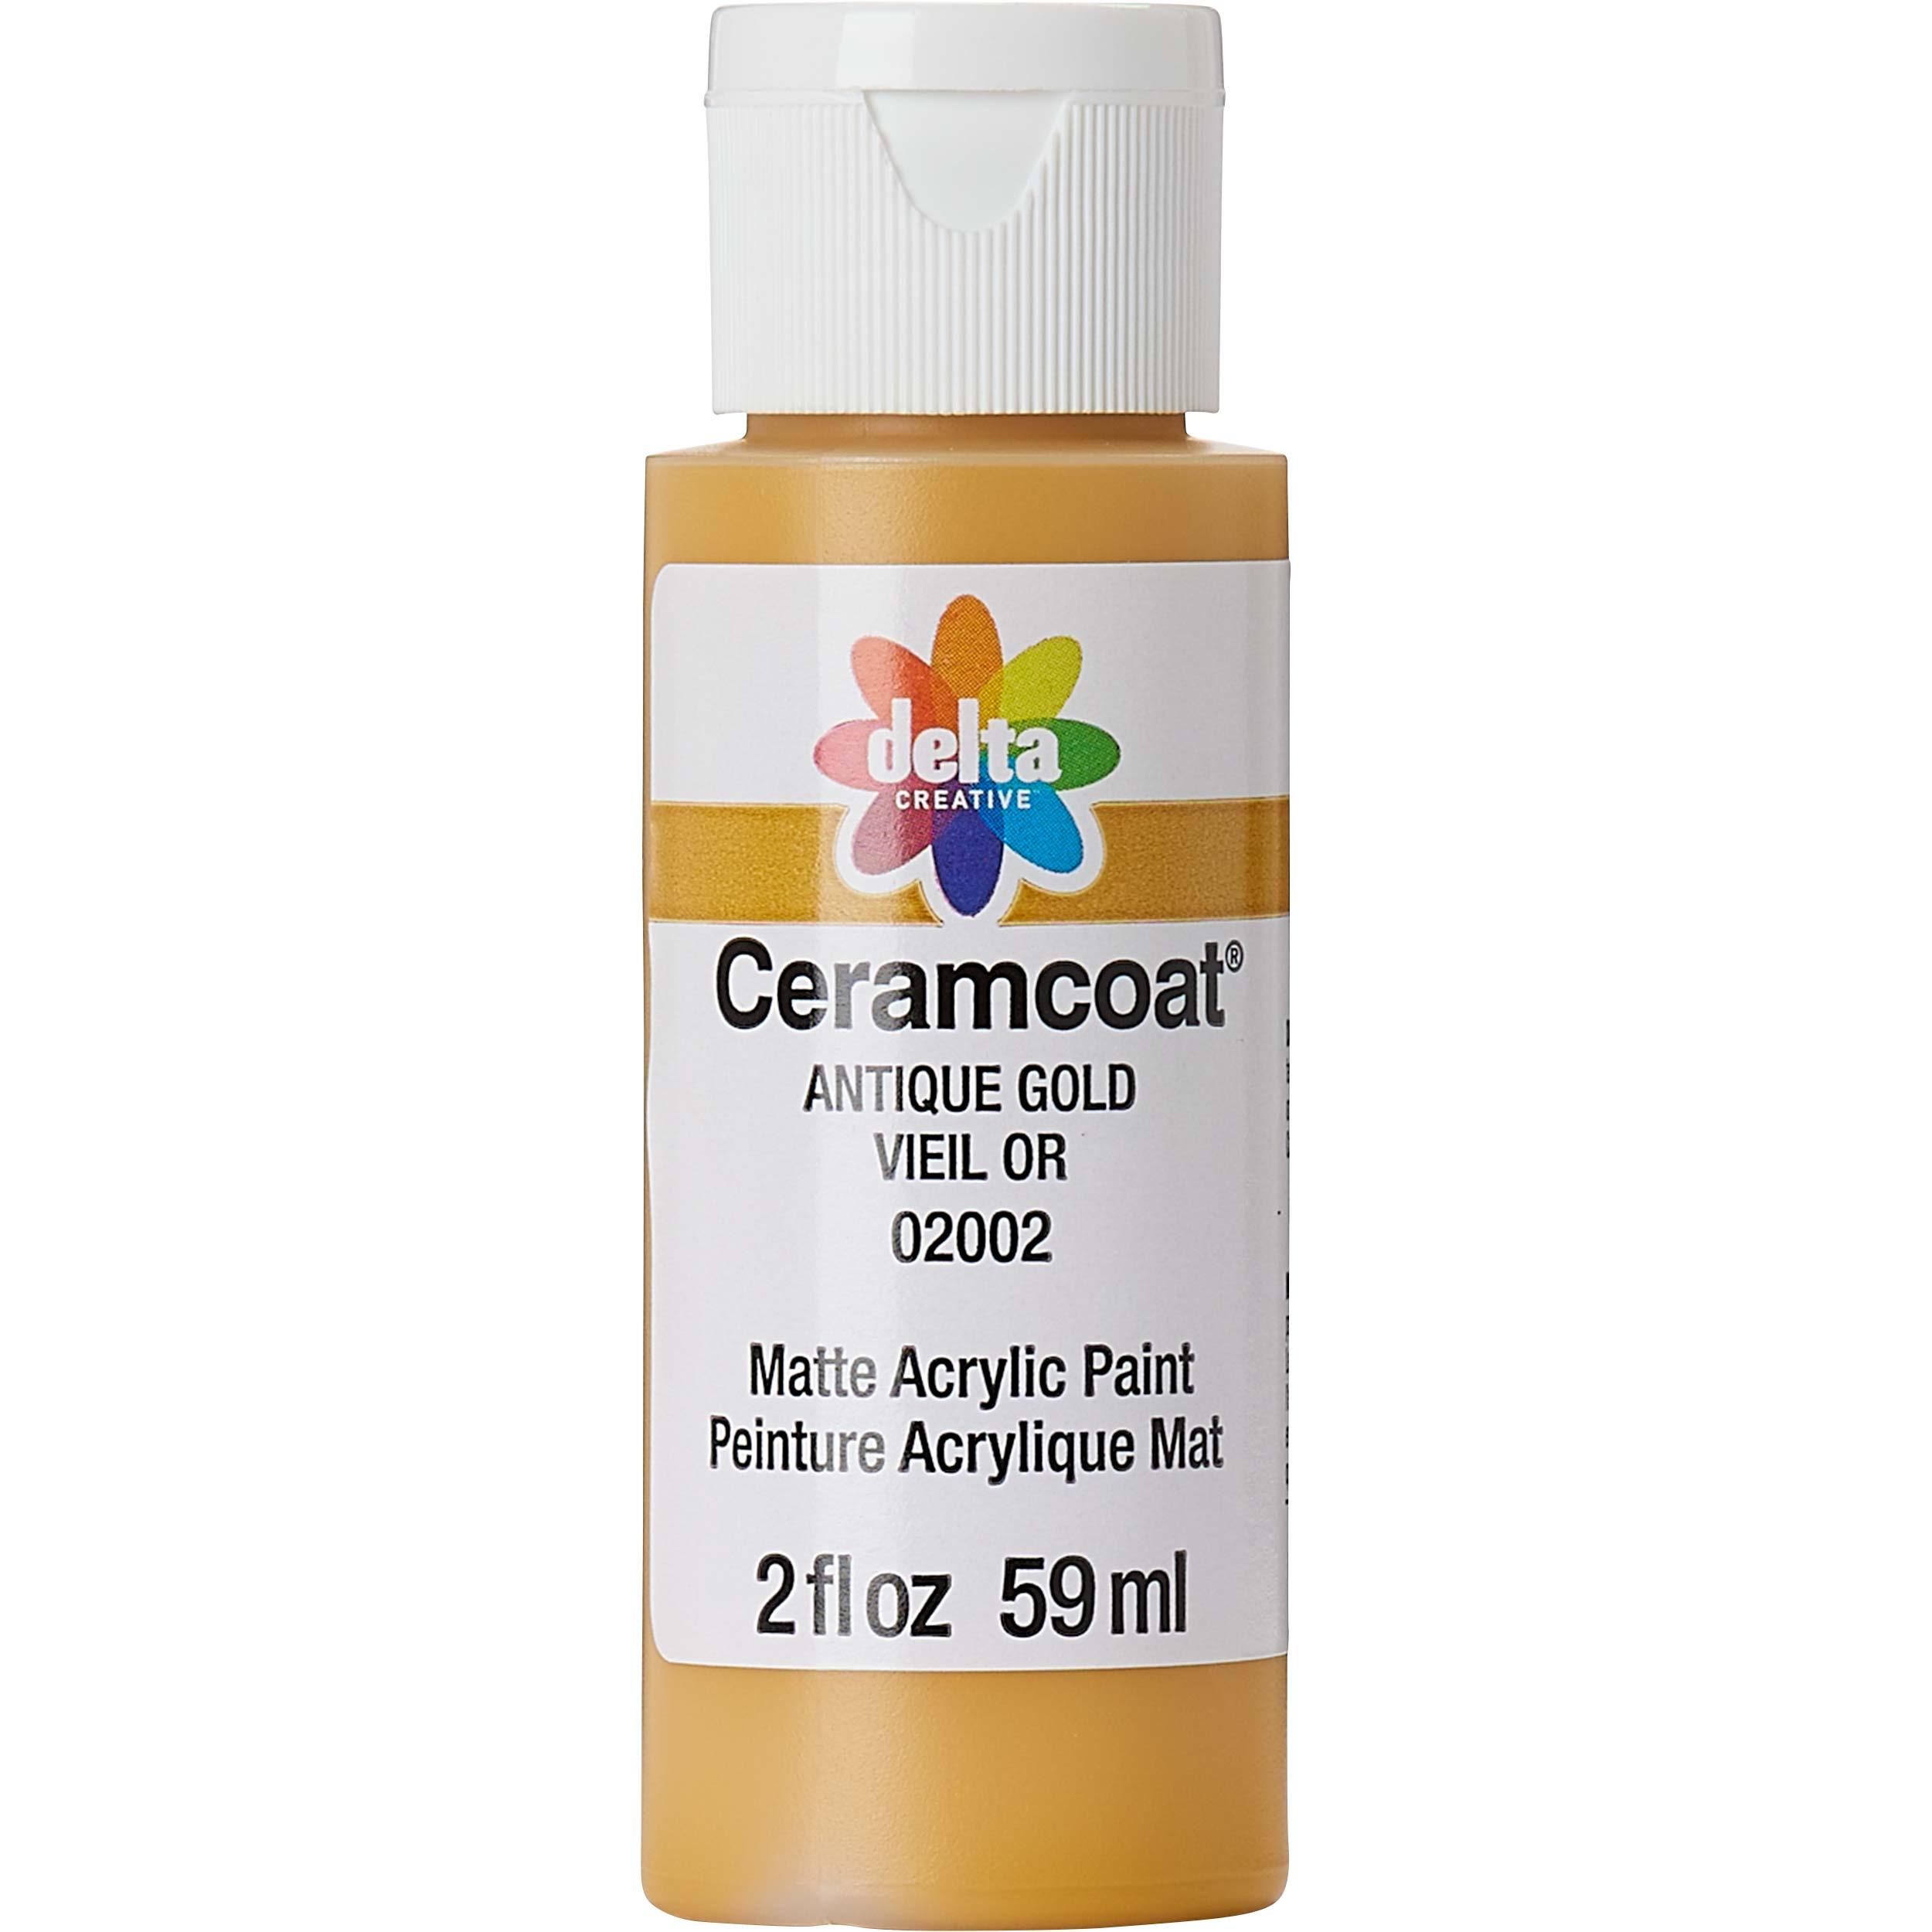 Delta Ceramcoat ® Acrylic Paint - Antique Gold, 2 oz.